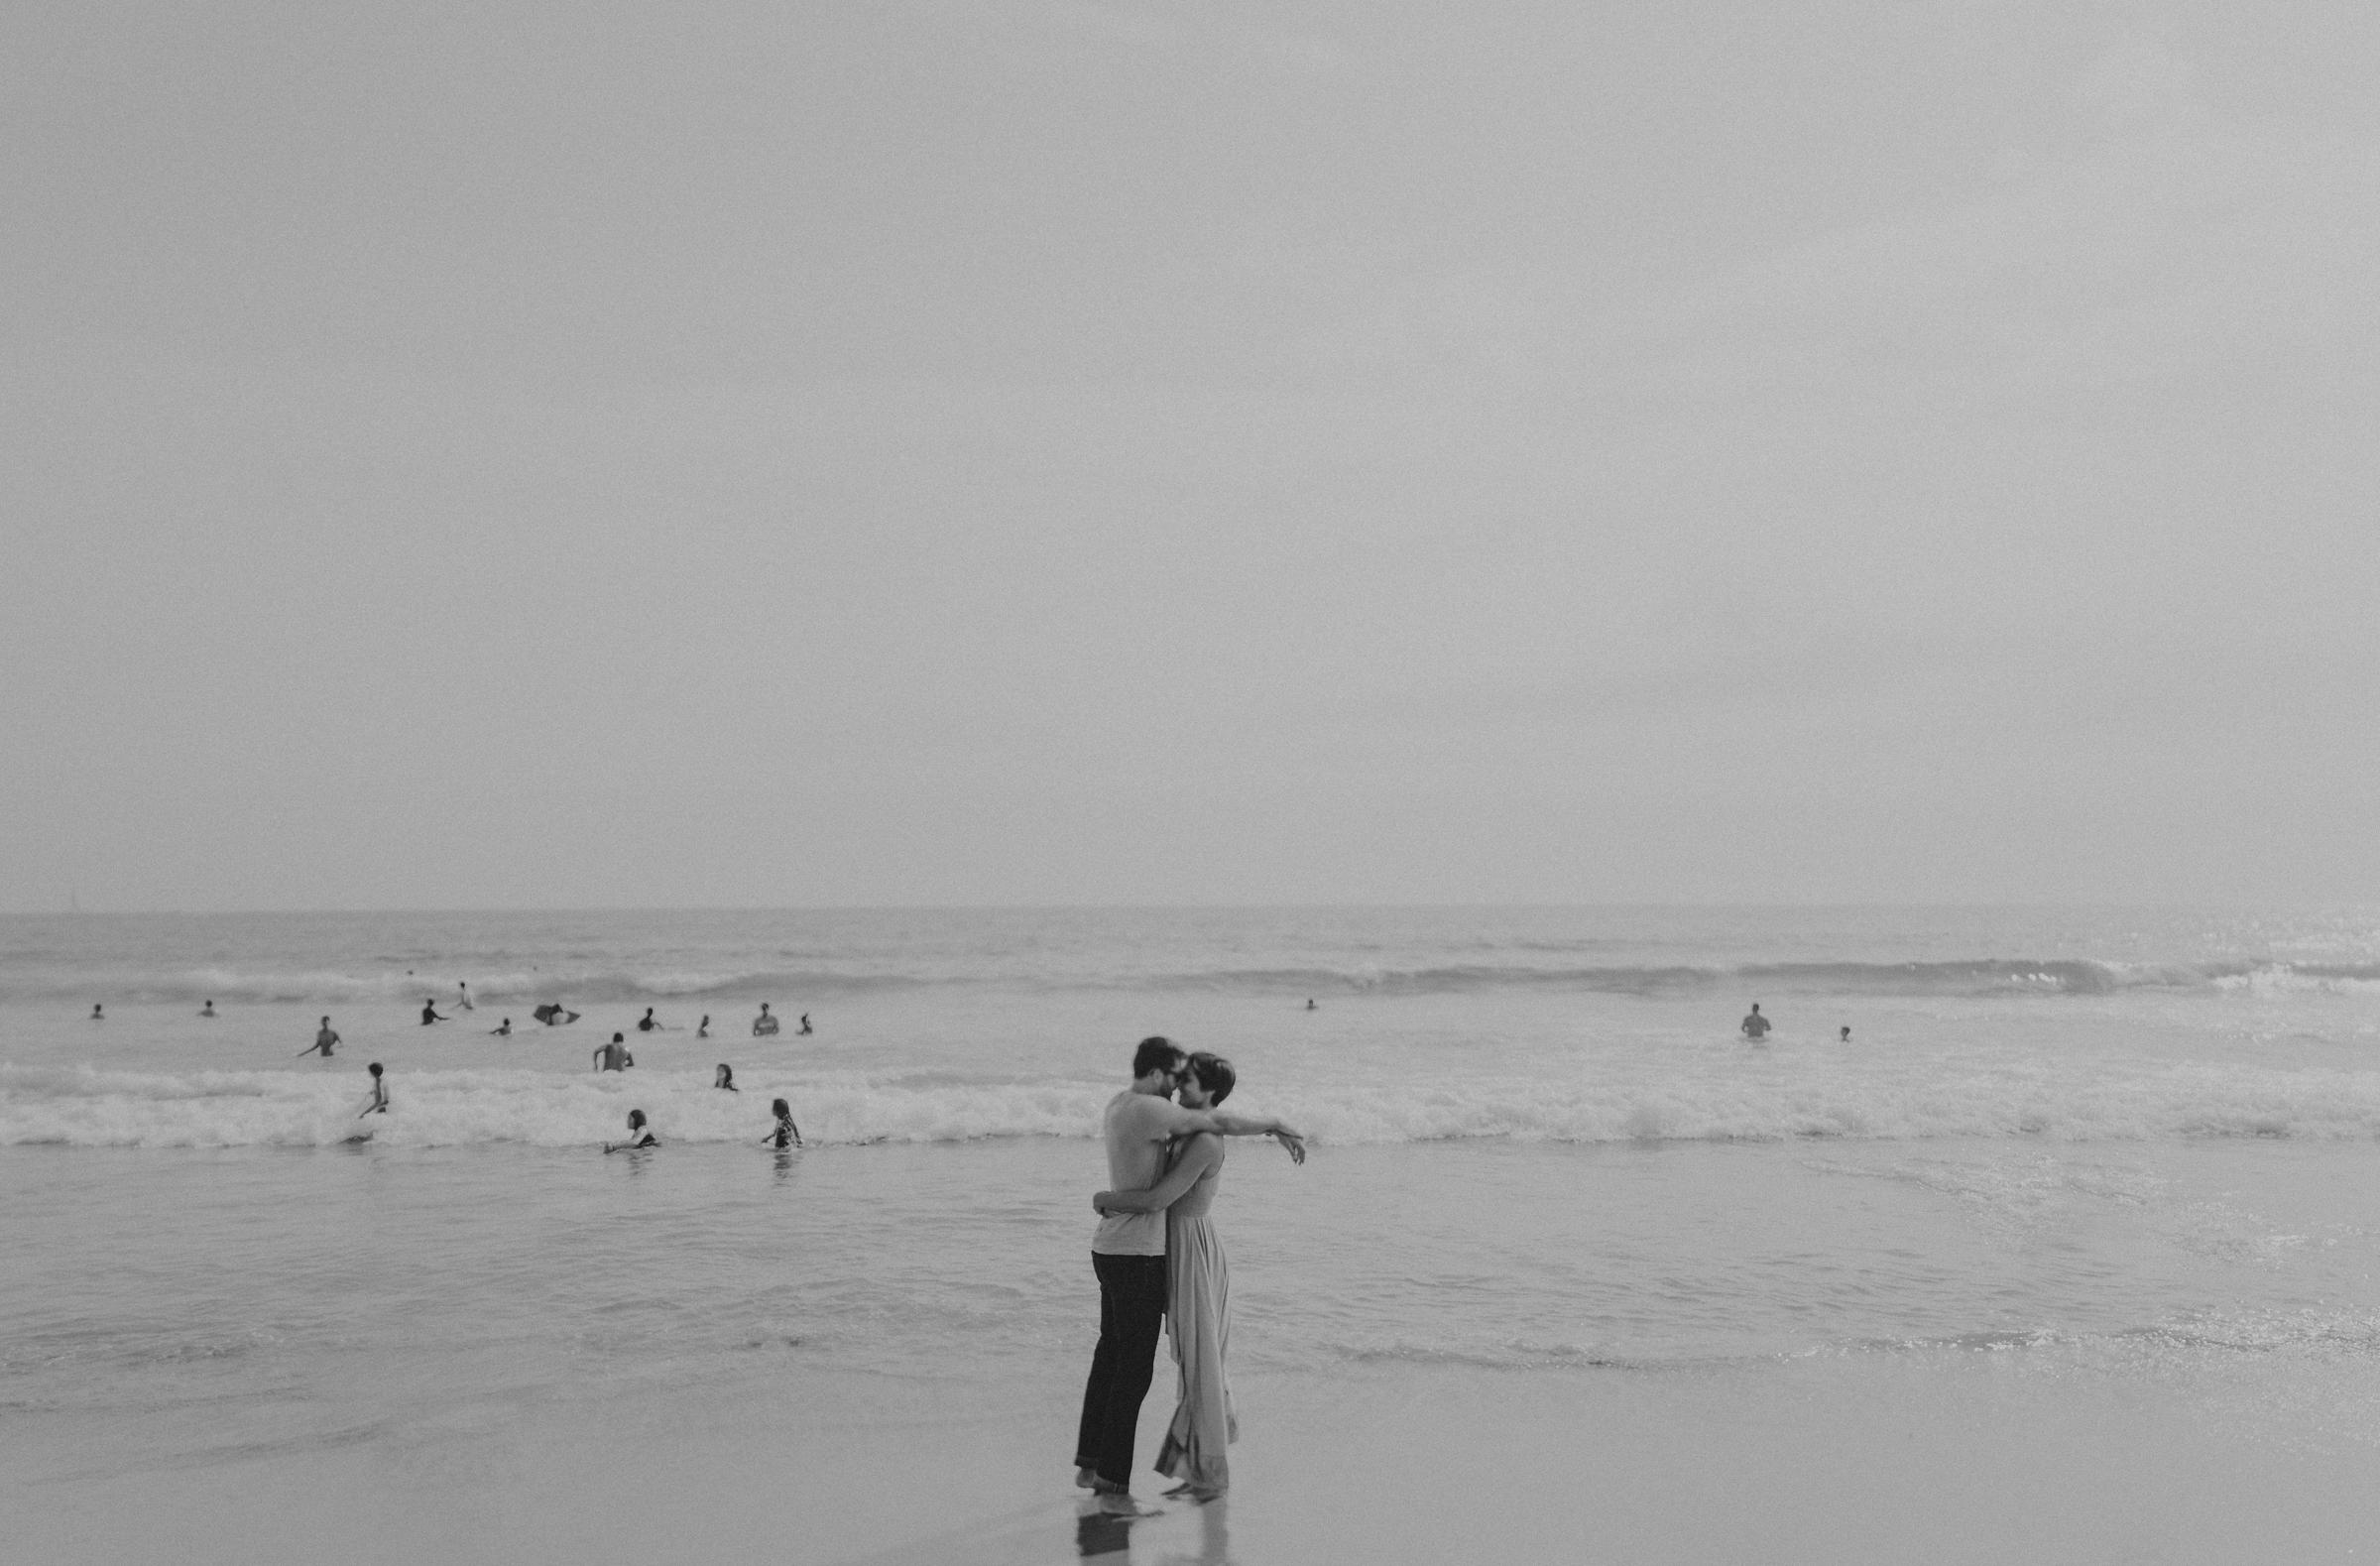 Isaiah + Taylor Photography - Venice Beach & Santa Monica Engagement Session, Los Angeles Wedding Photographer-057.jpg